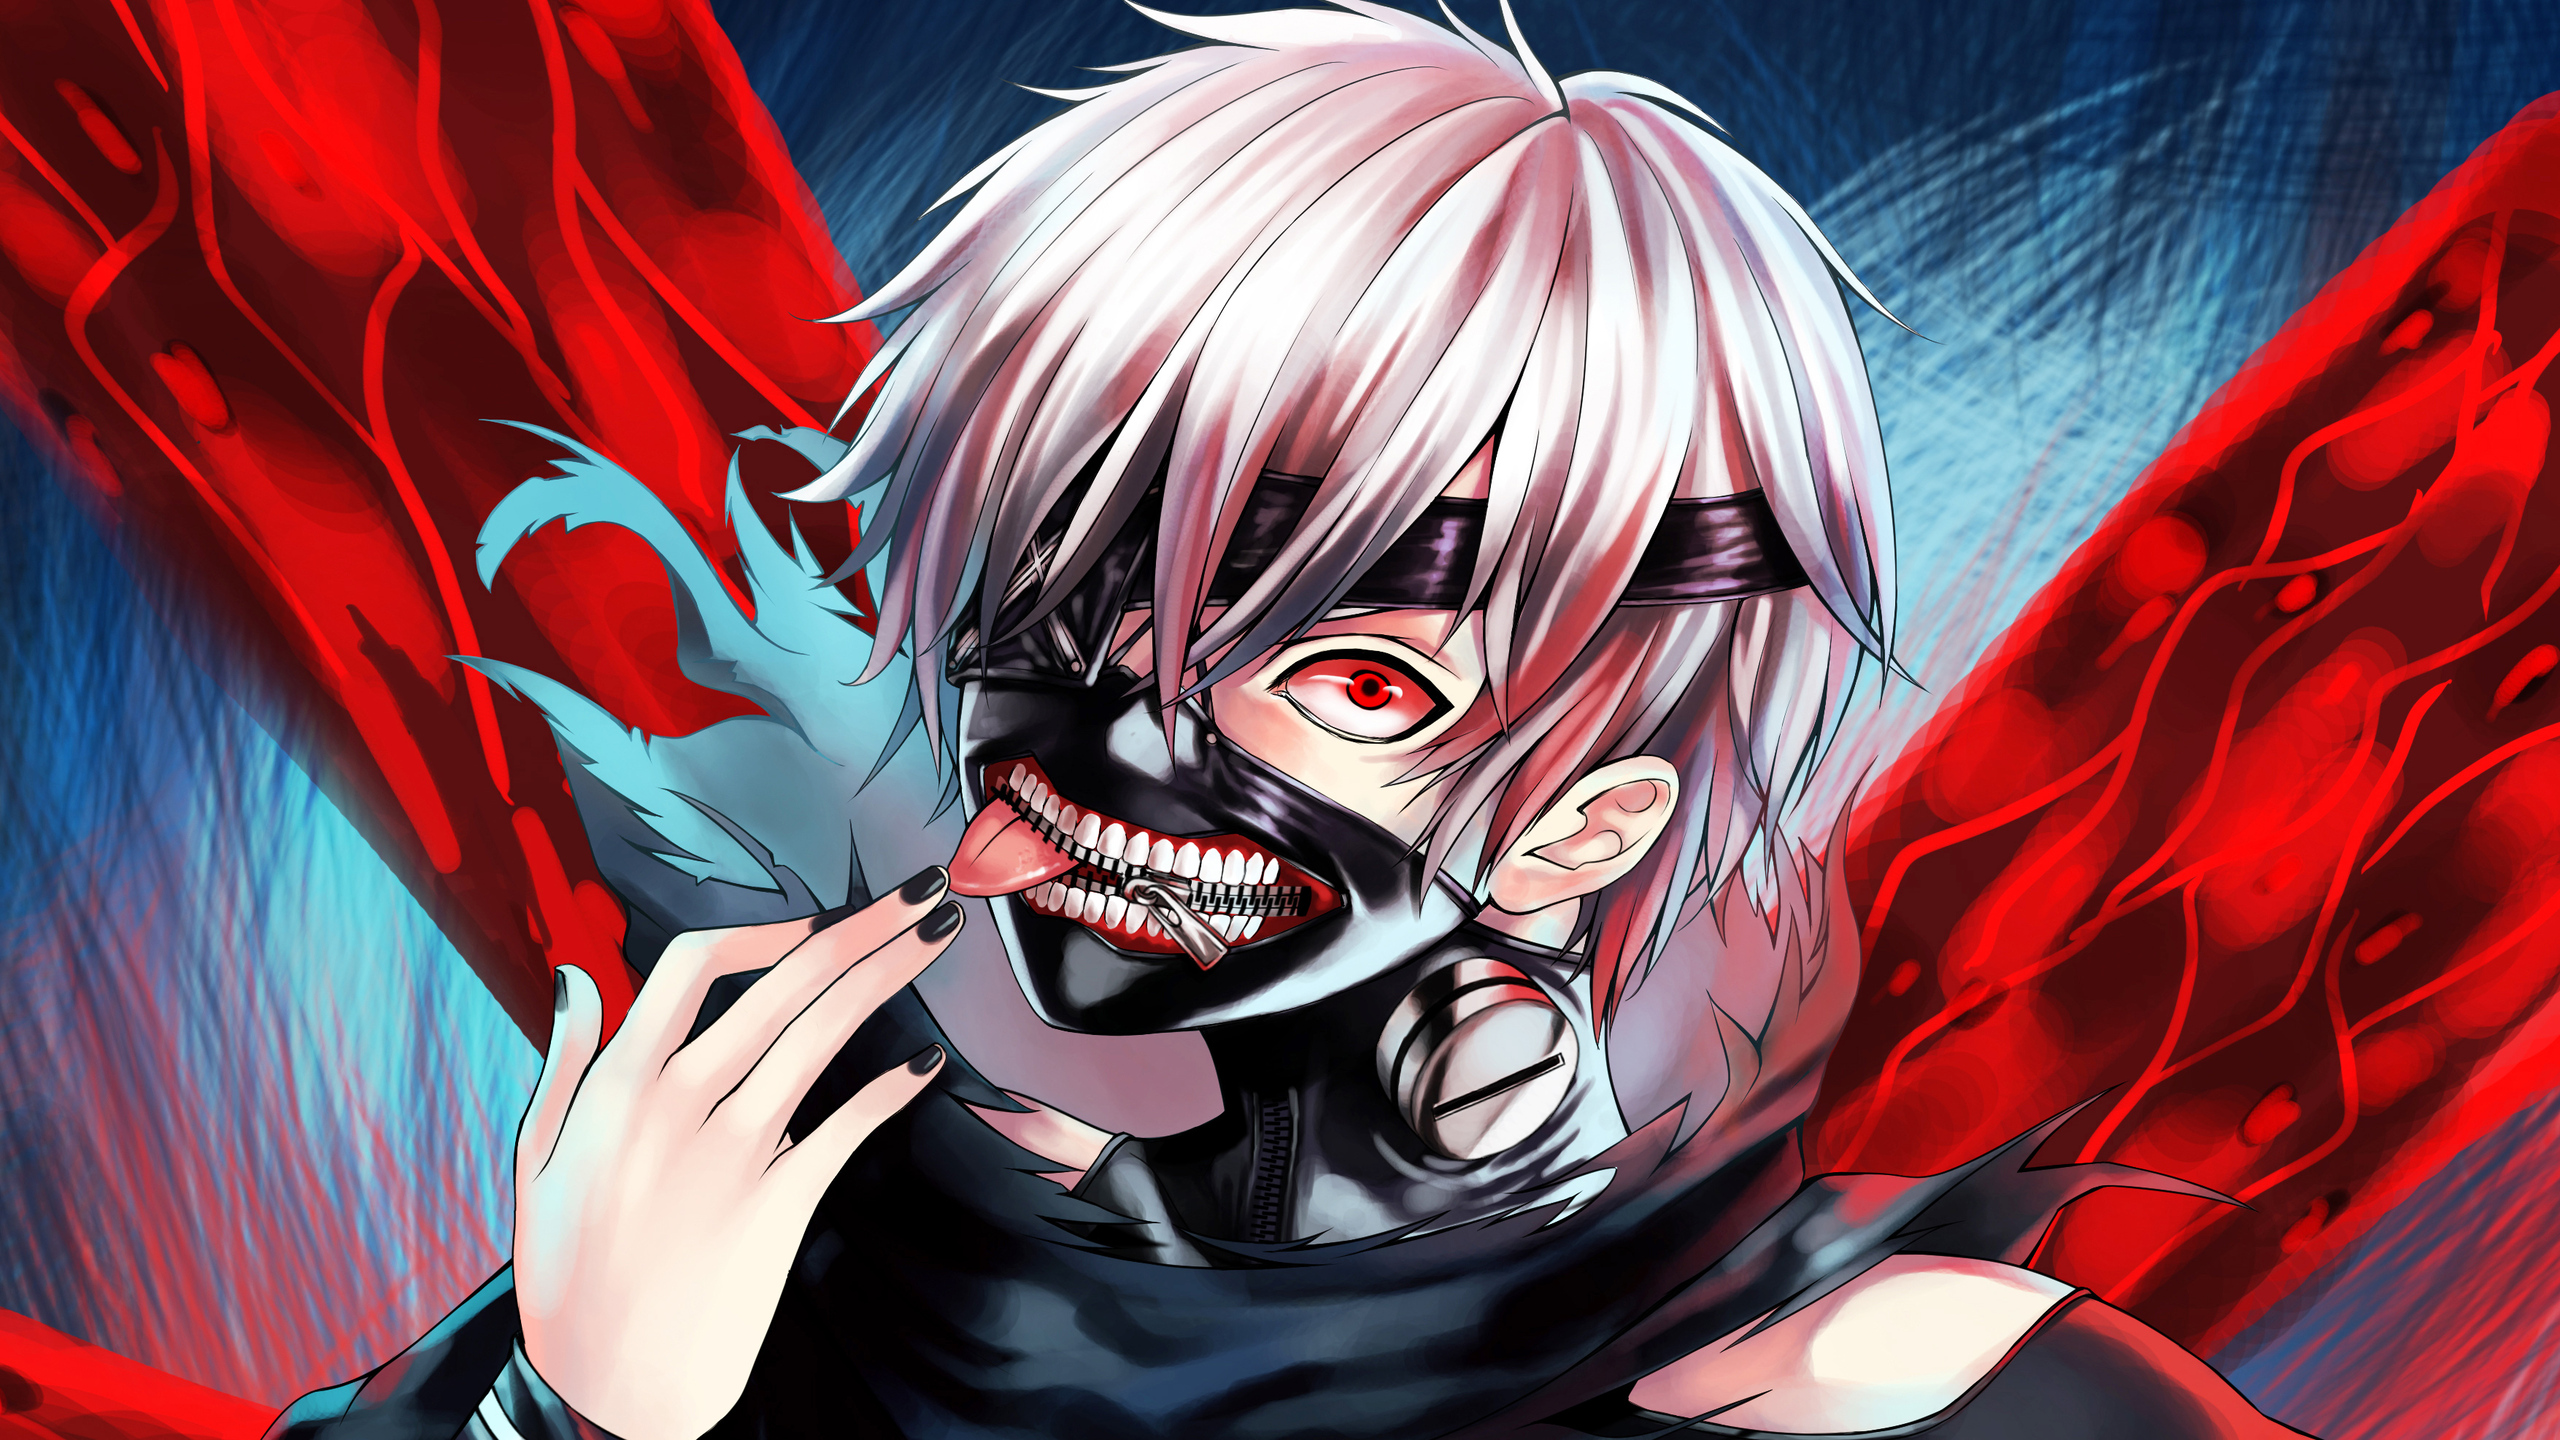 2560x1440 Tokyo Ghoul Anime 4k 1440p Resolution Hd 4k